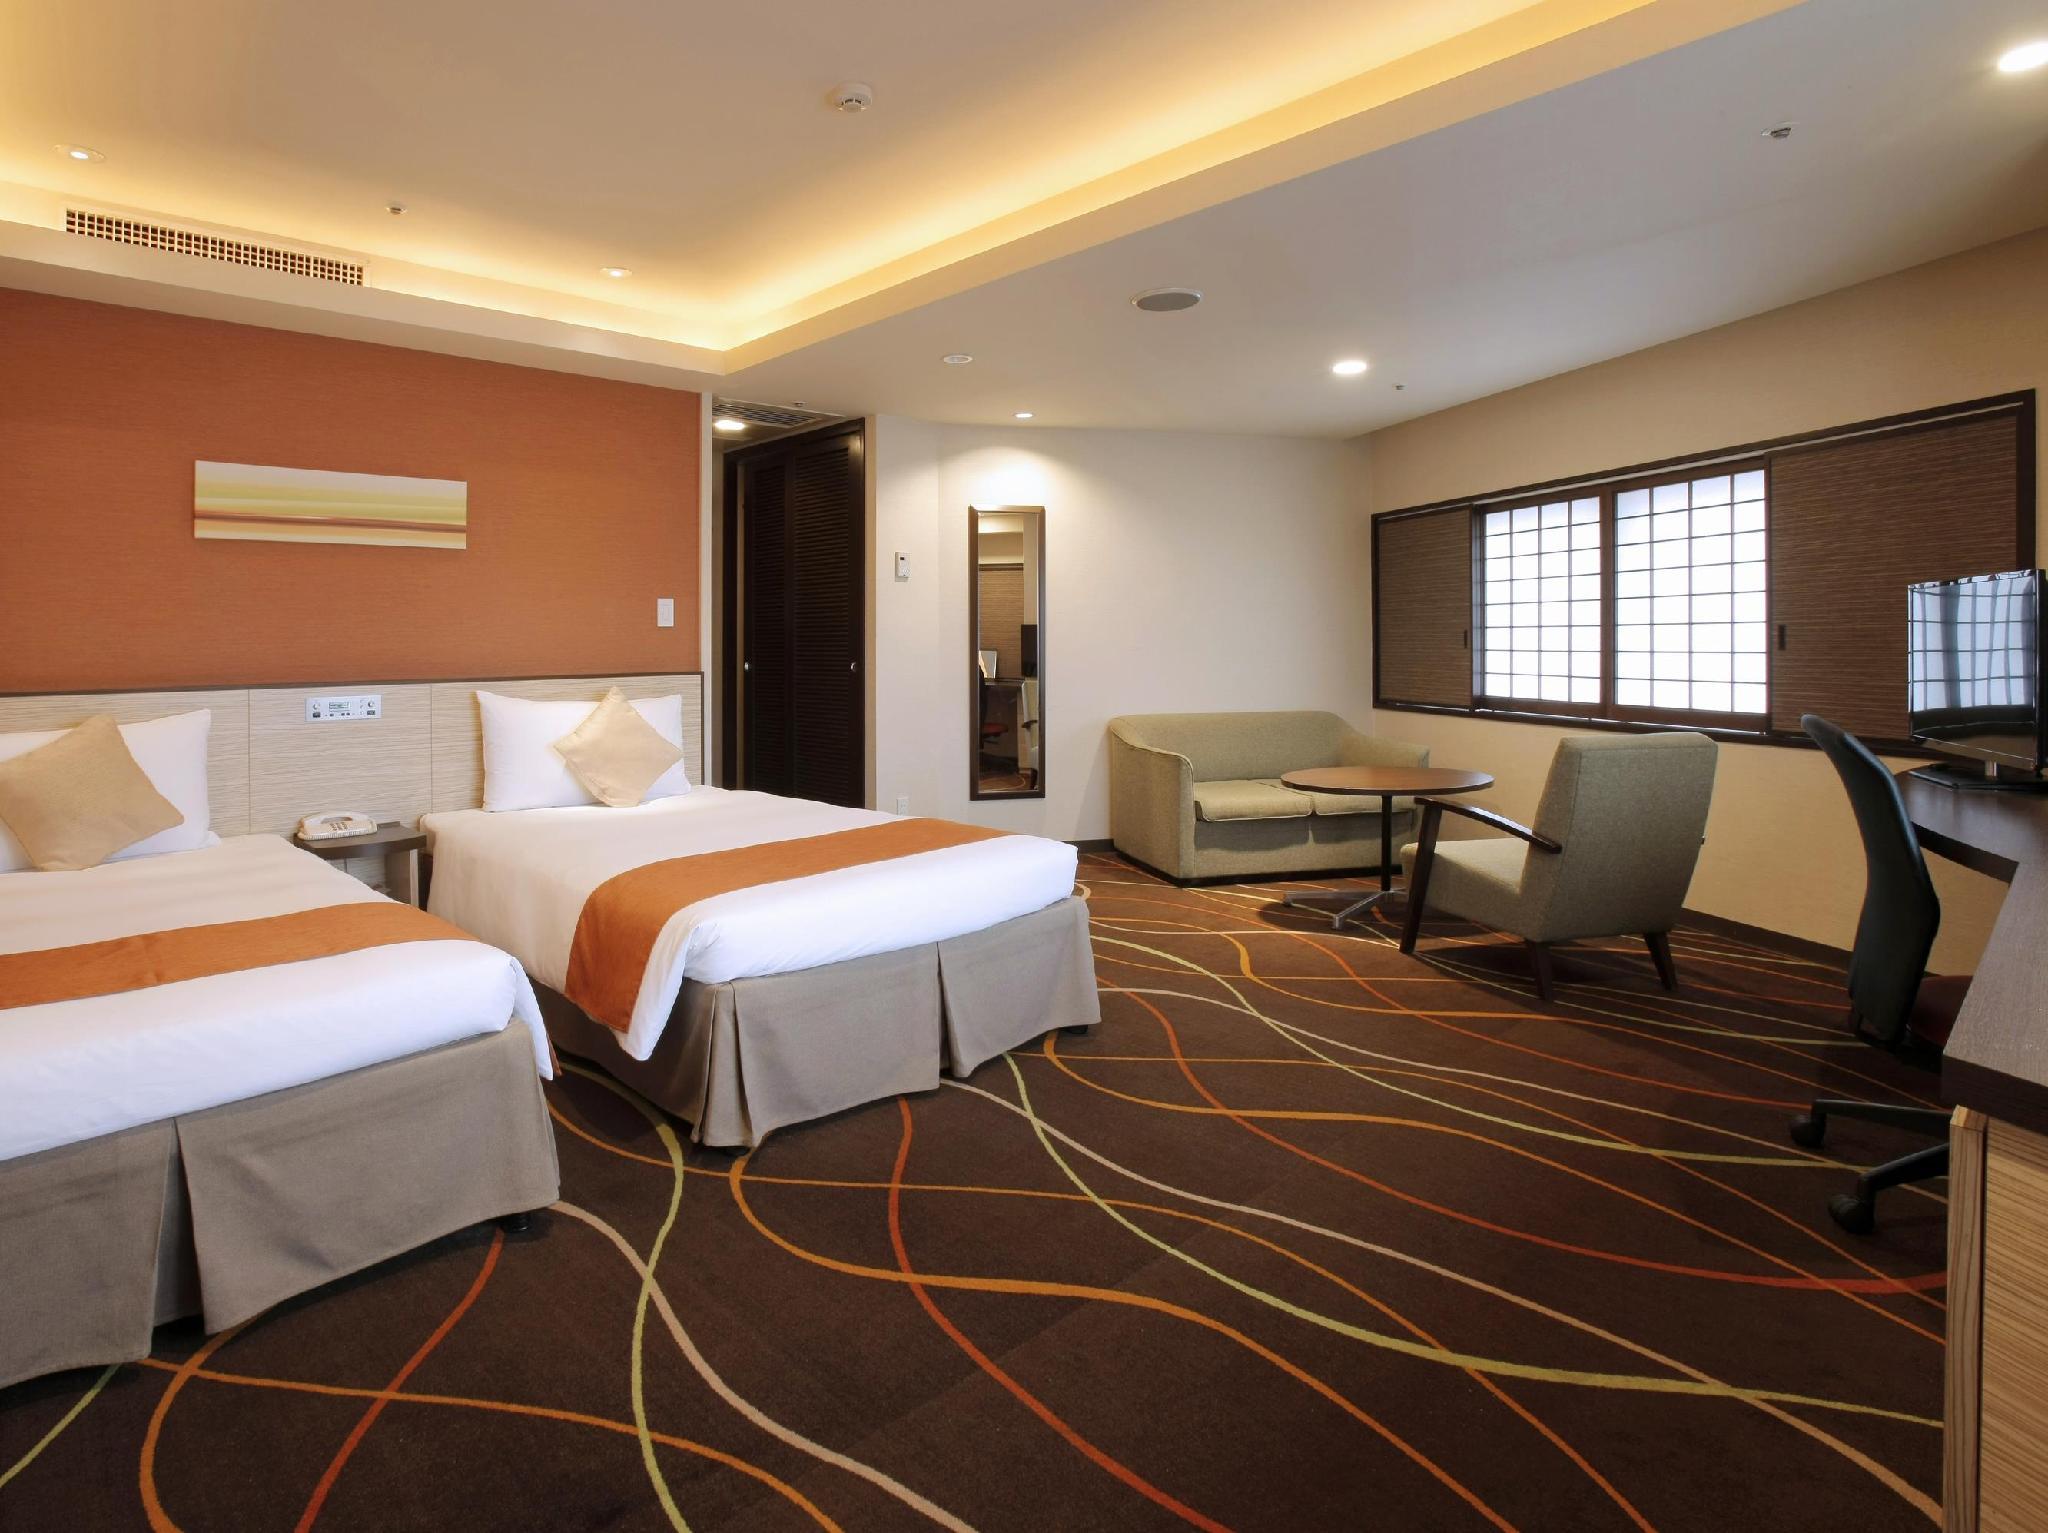 沖繩本島沖繩Nahana Spa飯店 (Okinawa Nahana Hotel & Spa)線上訂房 Agoda.com